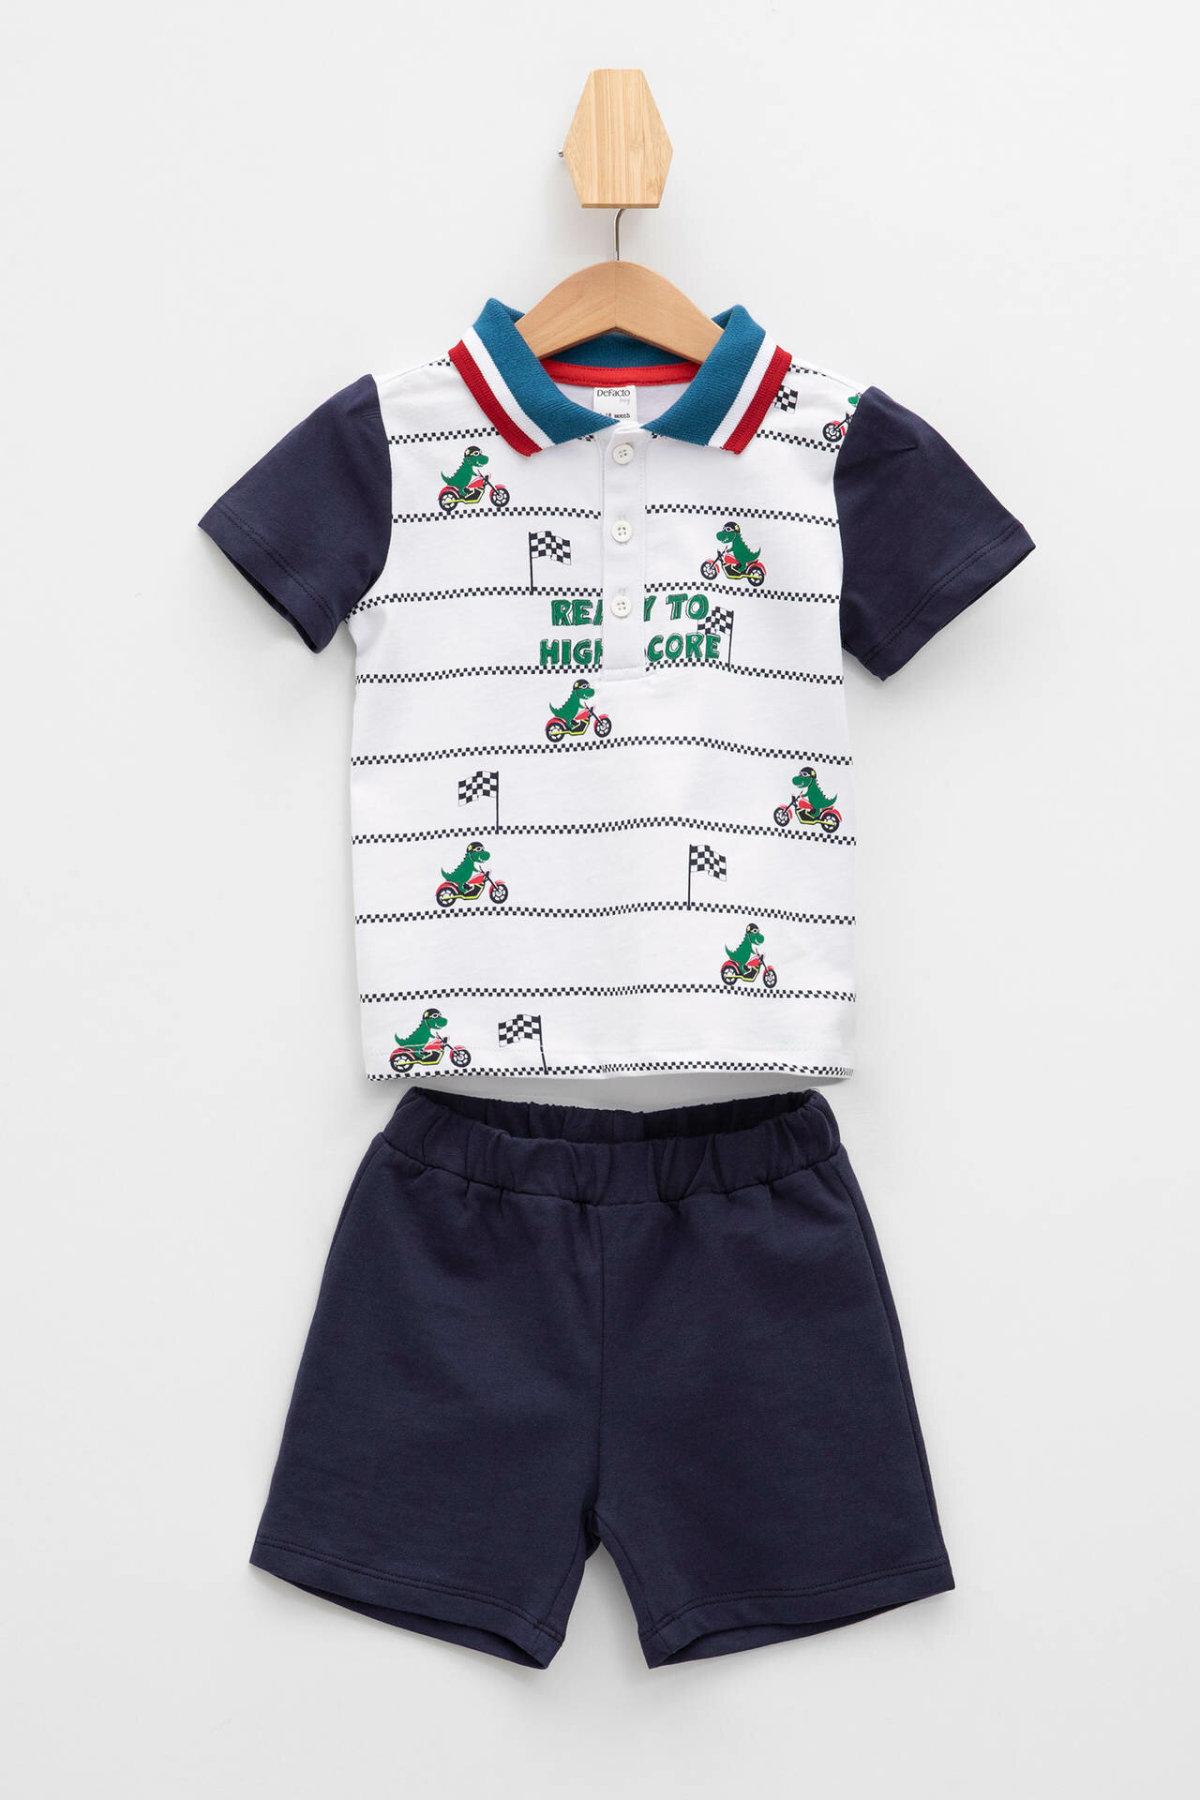 DeFacto Fashion BabyBoy Casual Set Kids Lapel Cute Pattern T-shirt Shorts Boys Comfortable Sets Summer New - K8294A219SM